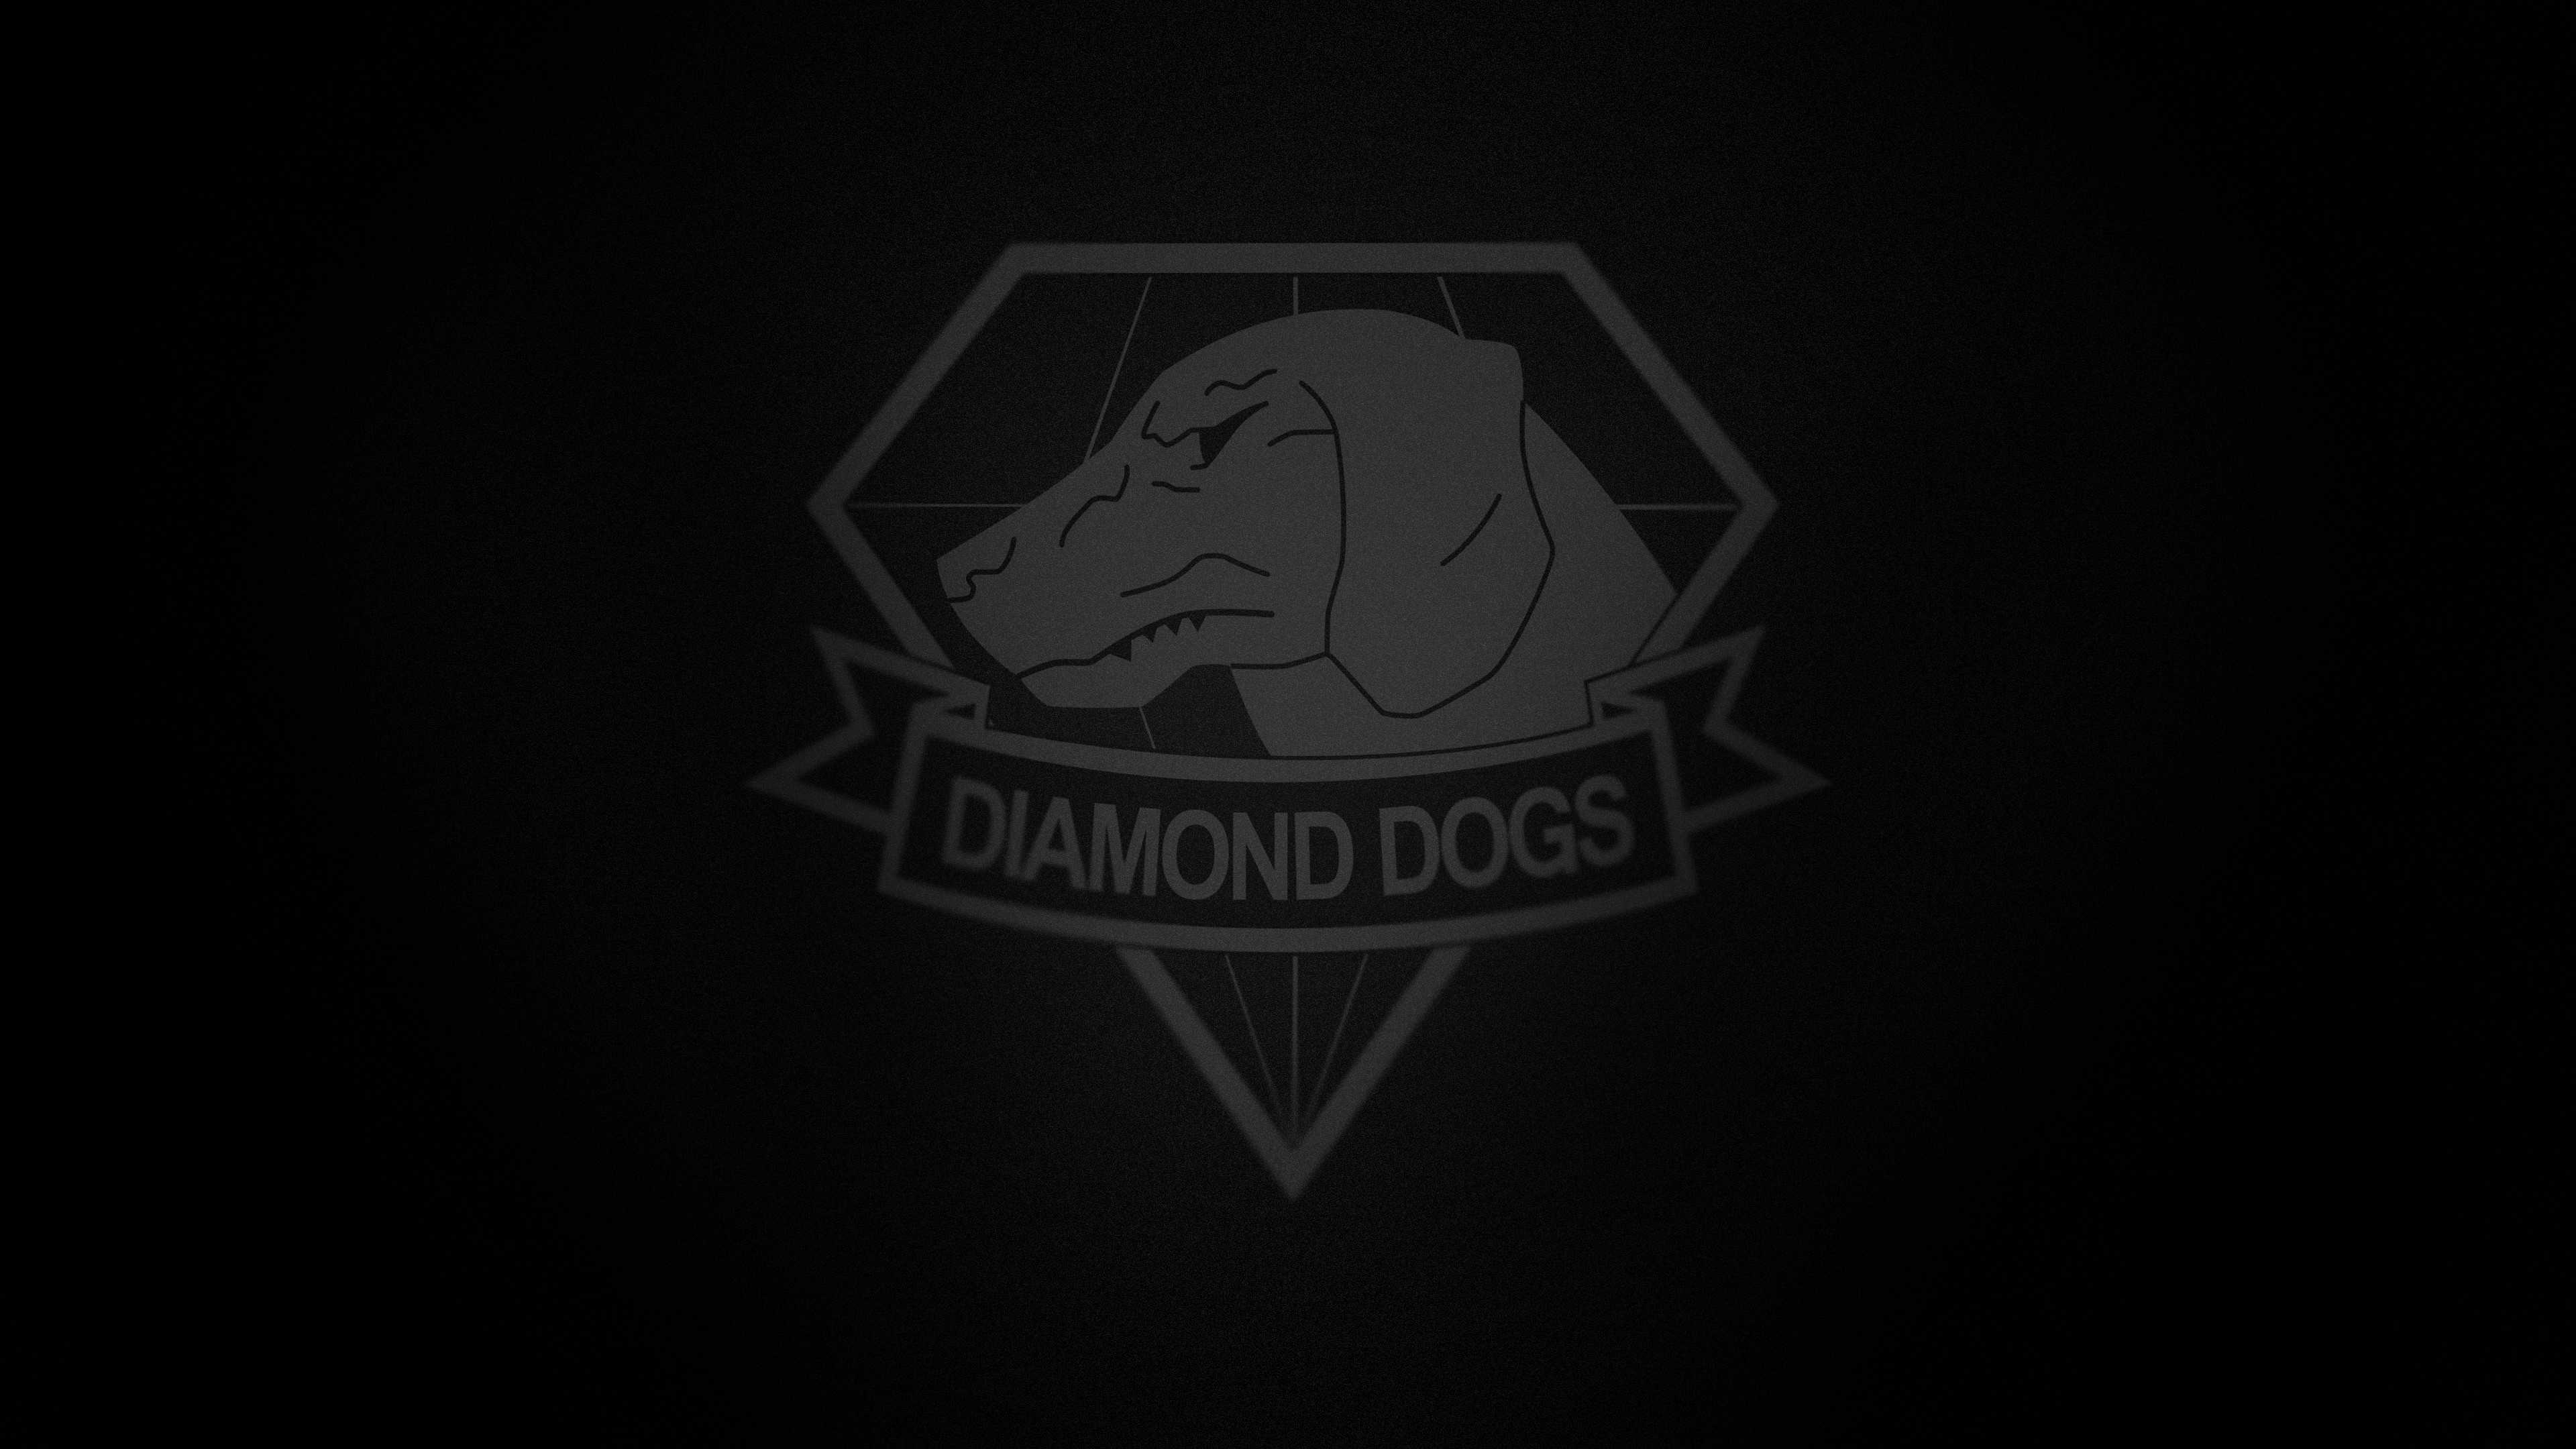 metal gear solid 5 phantom pain diamond dogs logo uhd 4k wallpaper